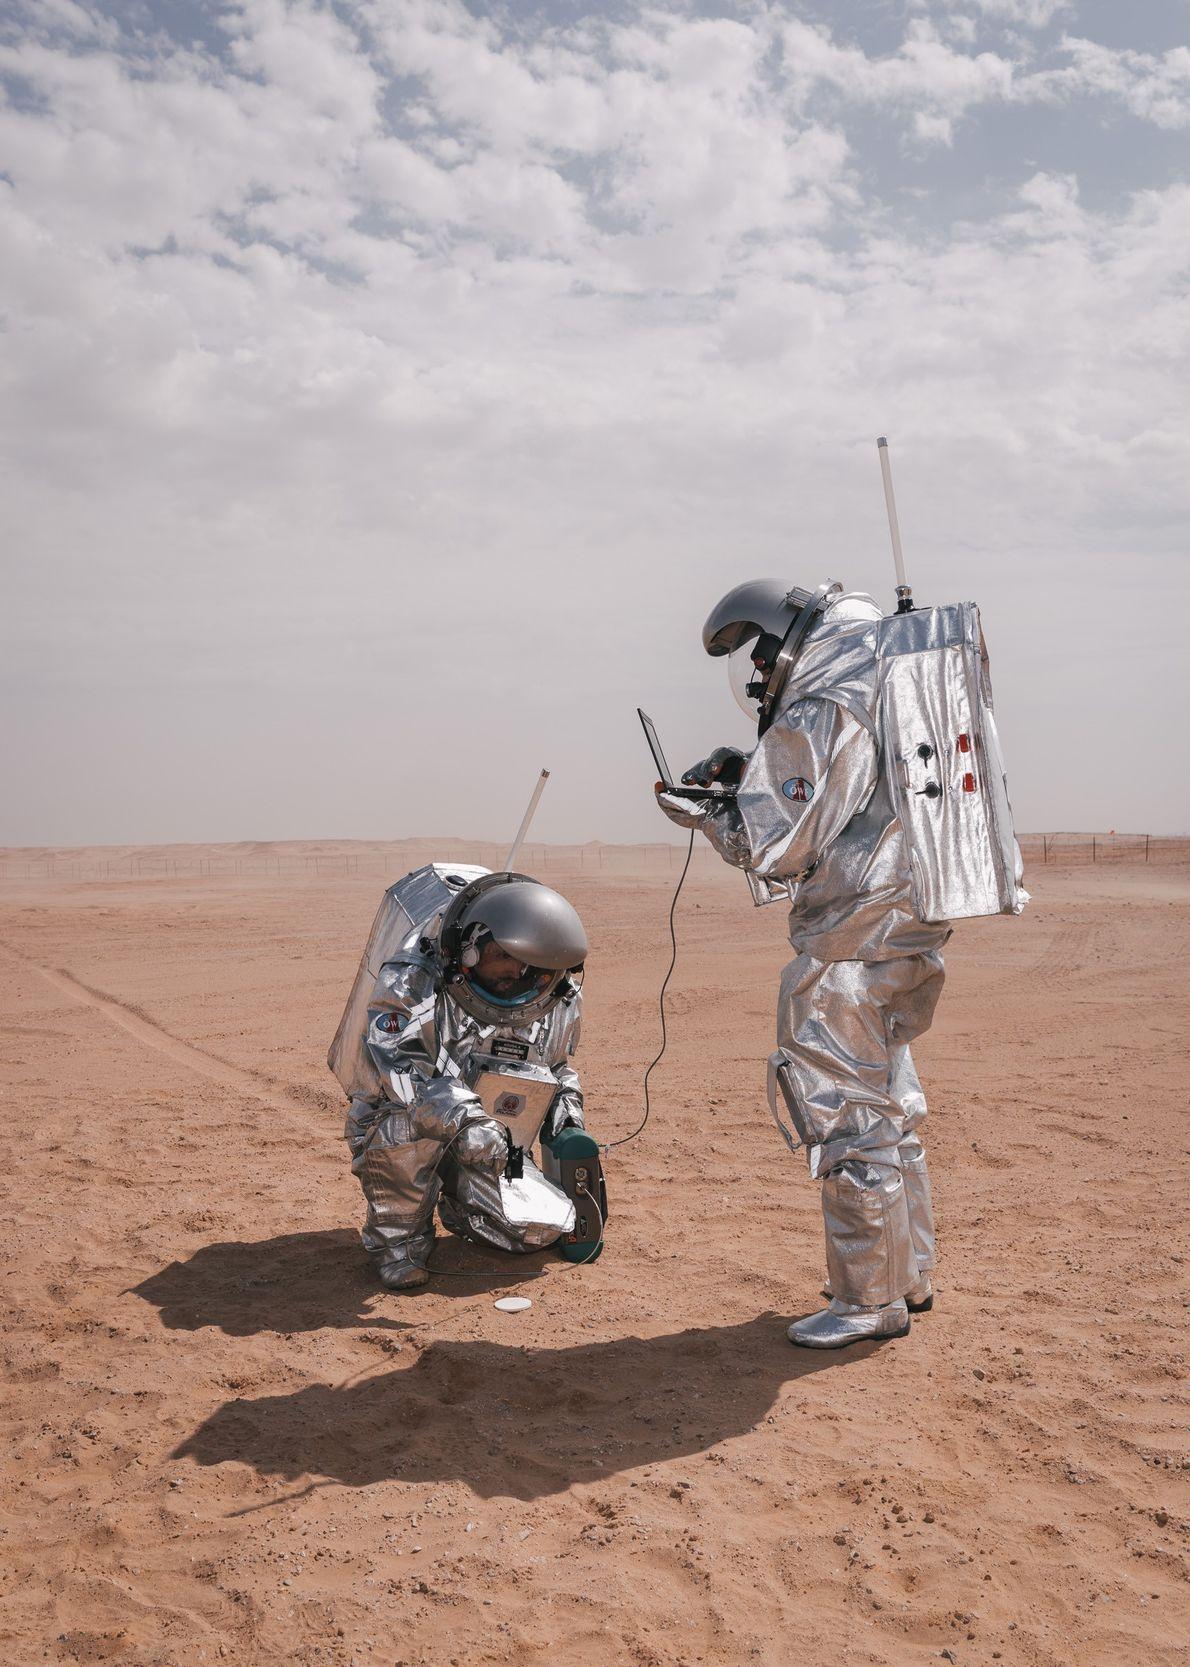 Astronautas análogos Carmen Köhler e Iñigo Muñoz Elorza